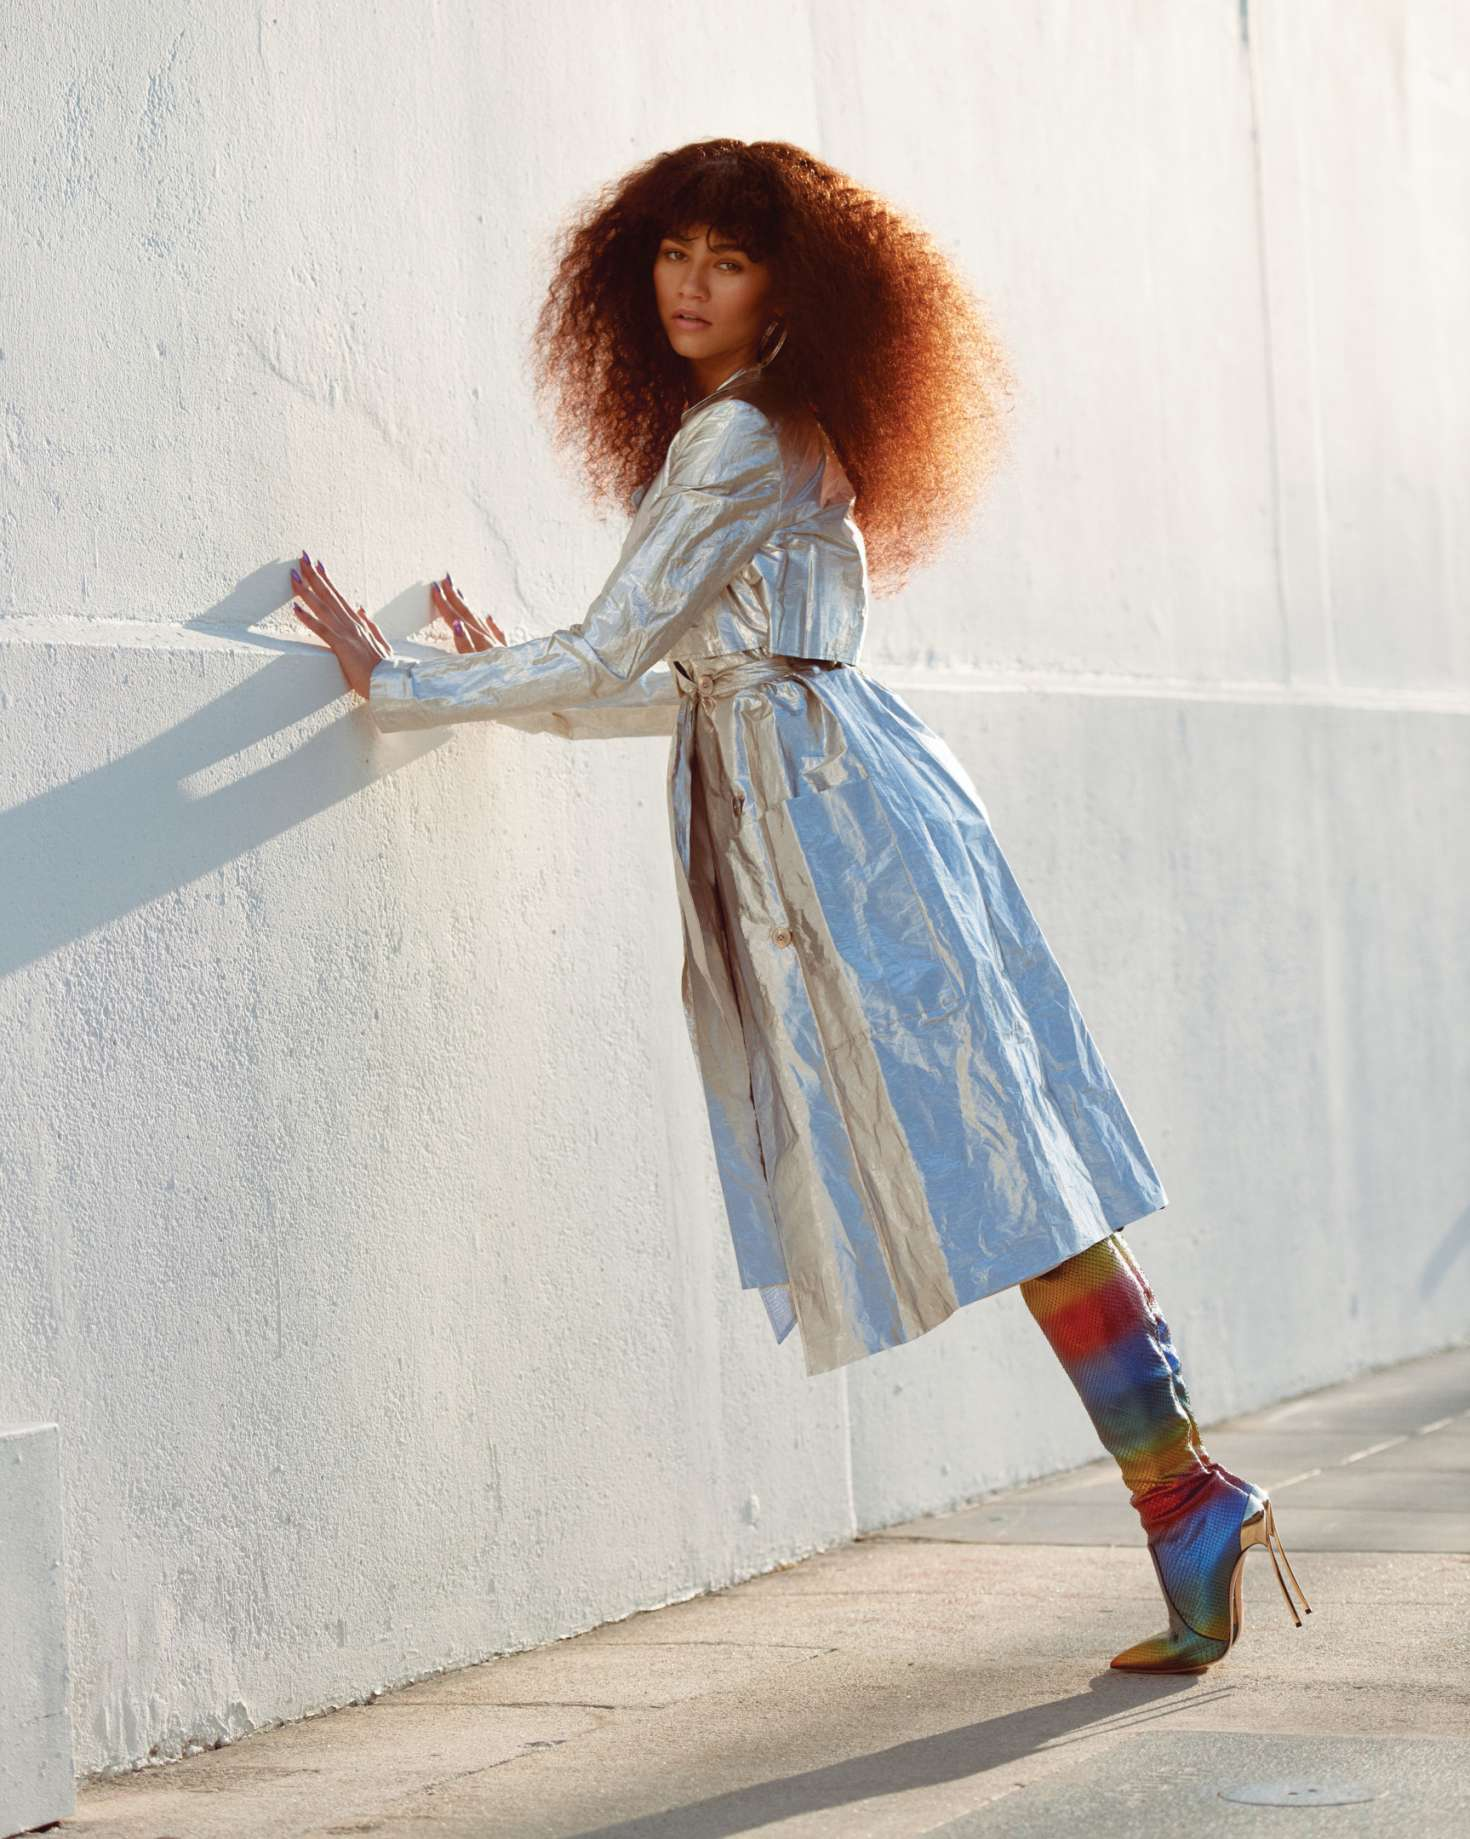 Fashion magazine on twitter Red Carpet Dresses, Fashion Trends Celebrity Style